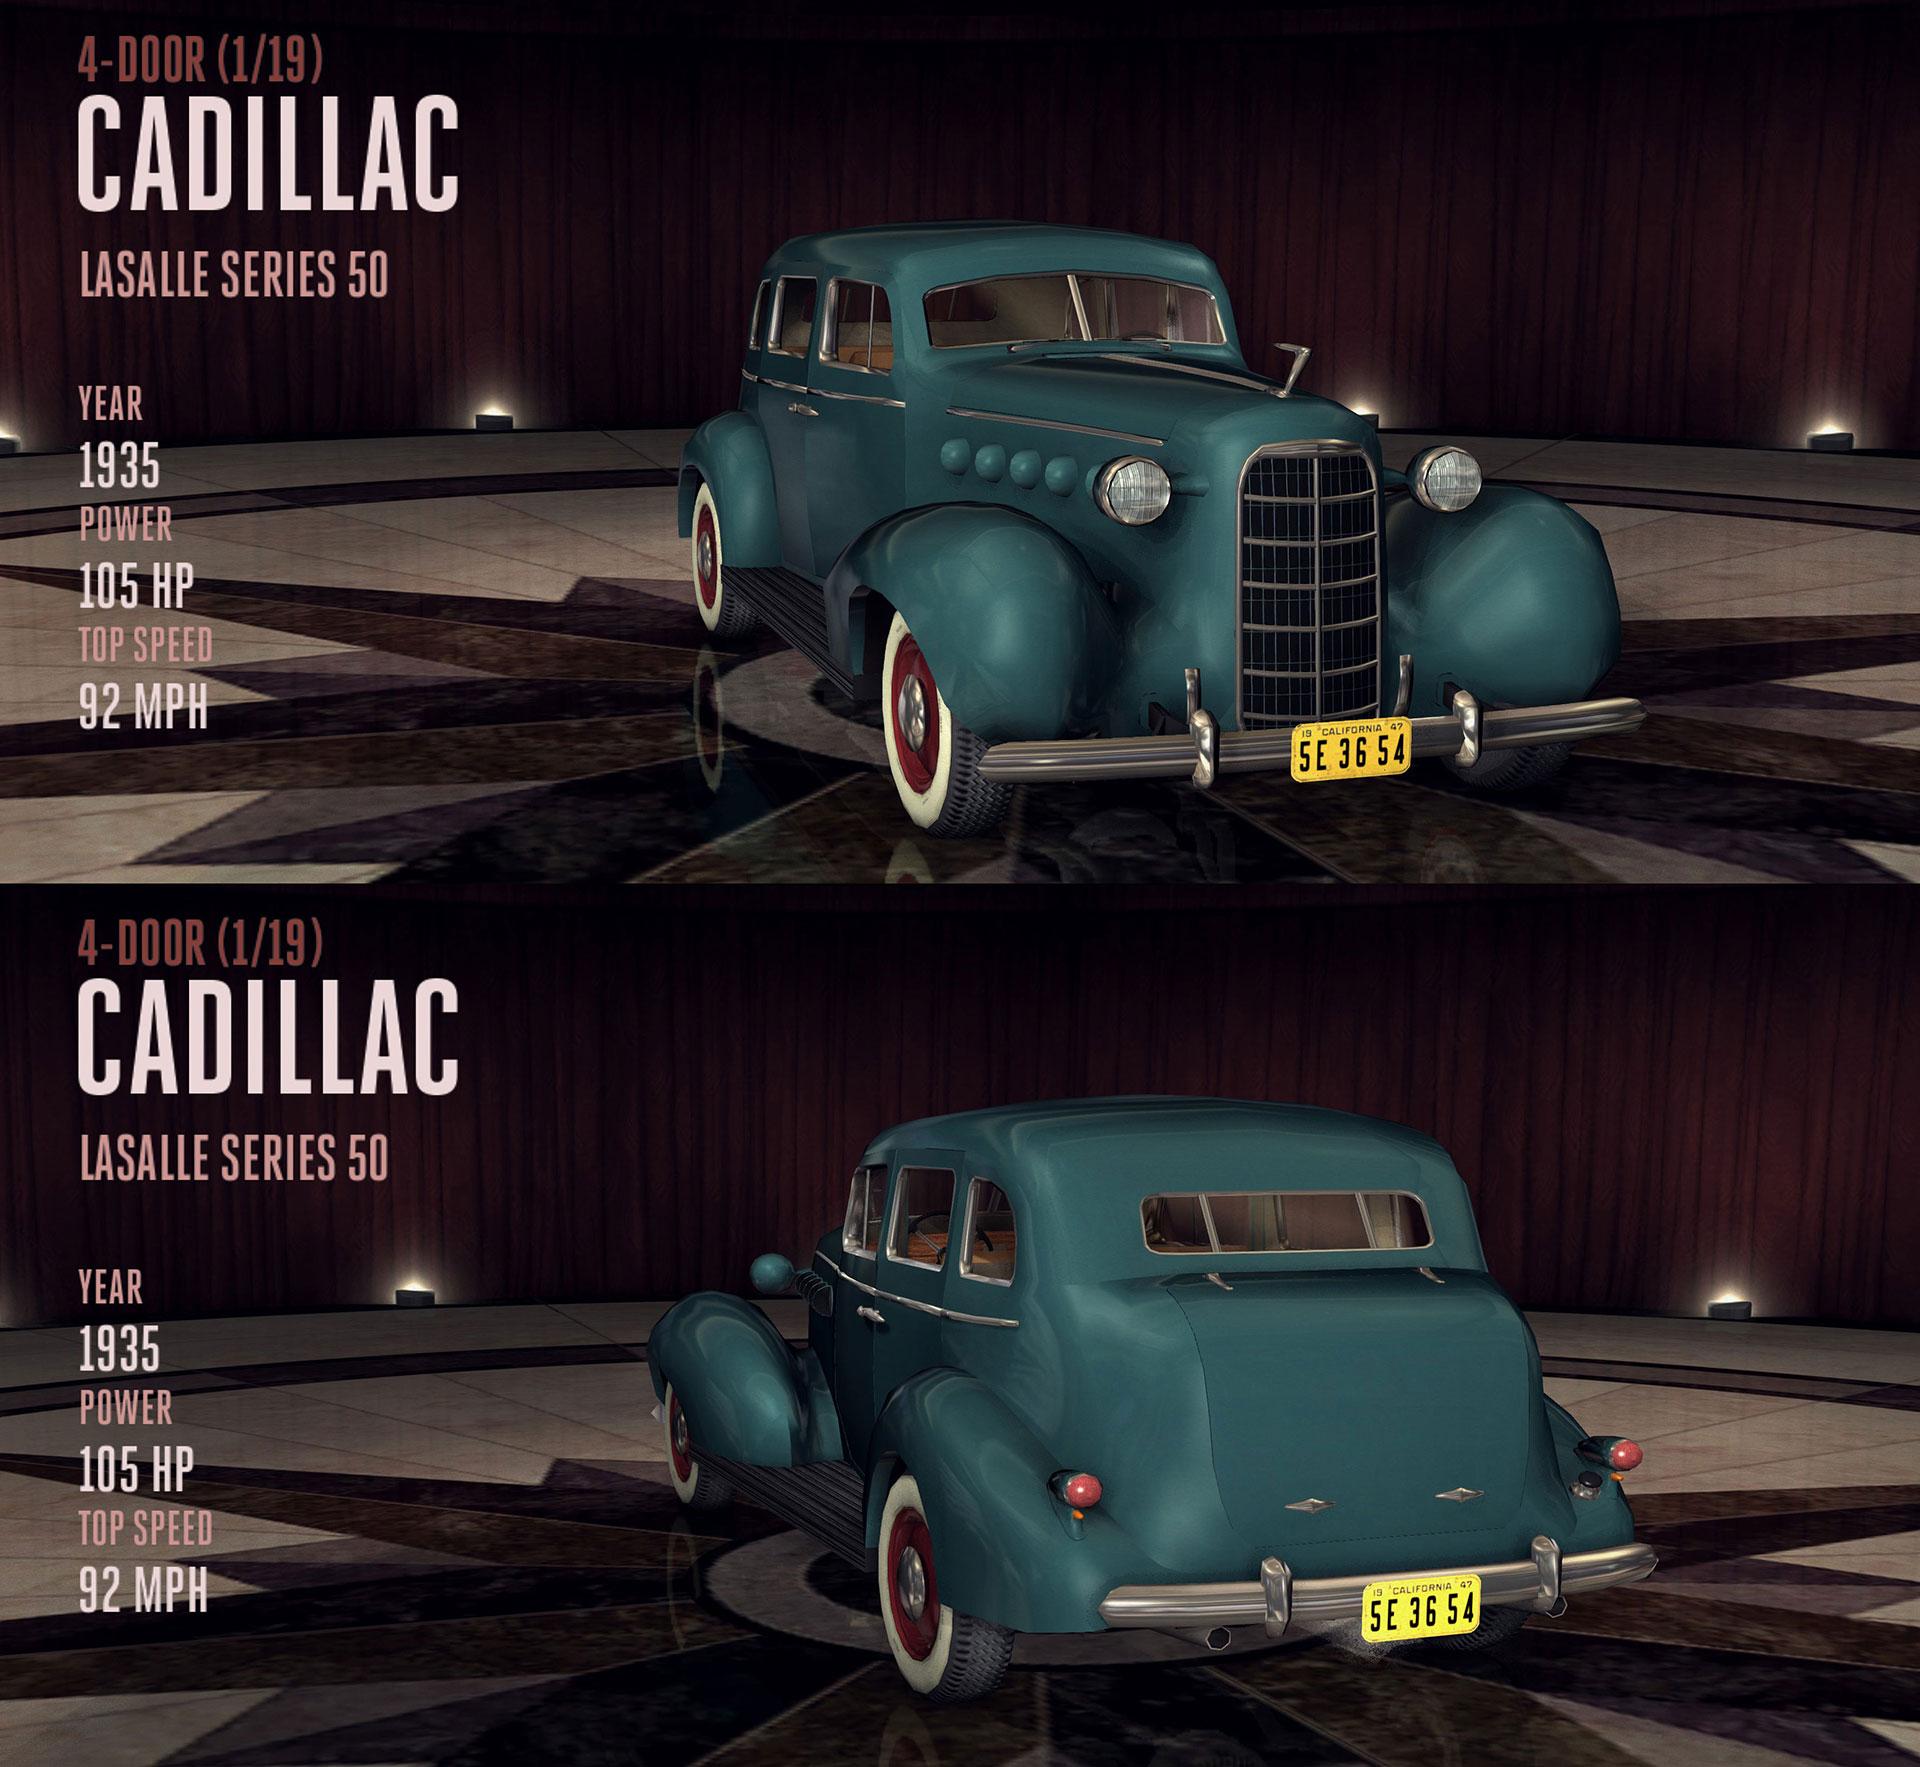 Cadillac LaSalle Series 50